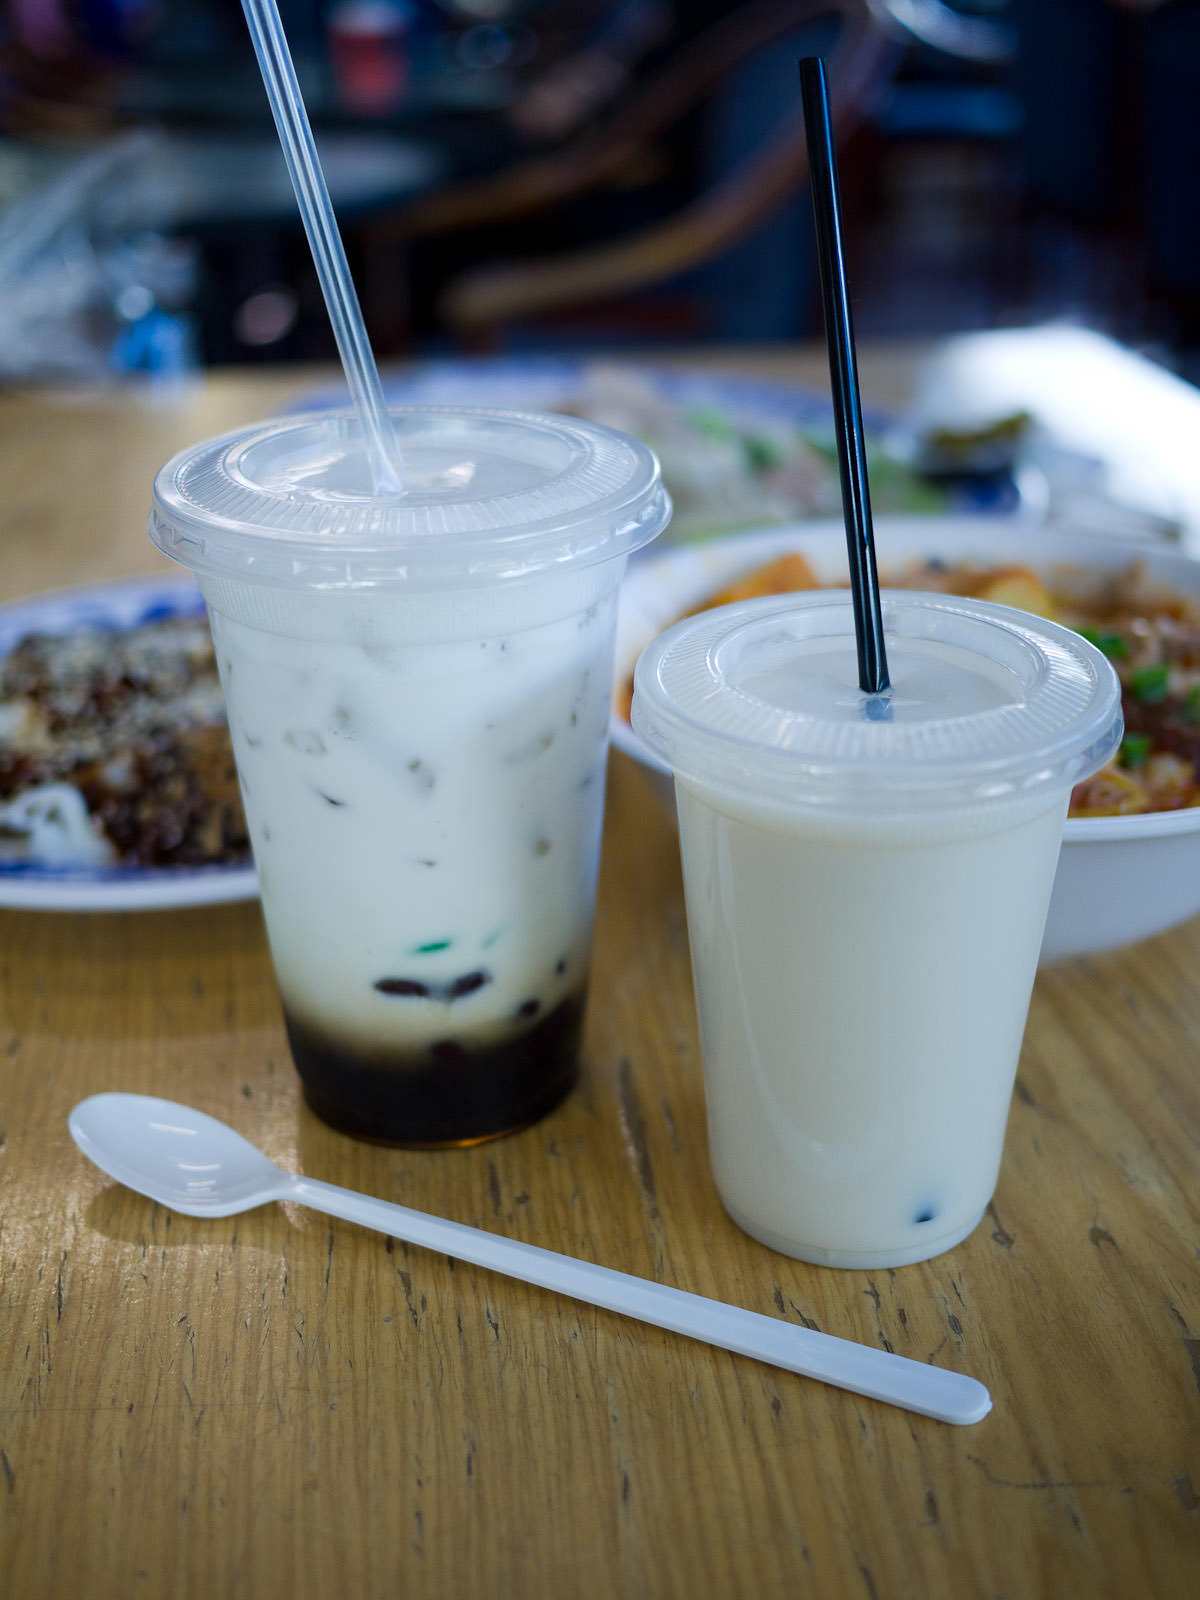 Cendol and soya bean milk